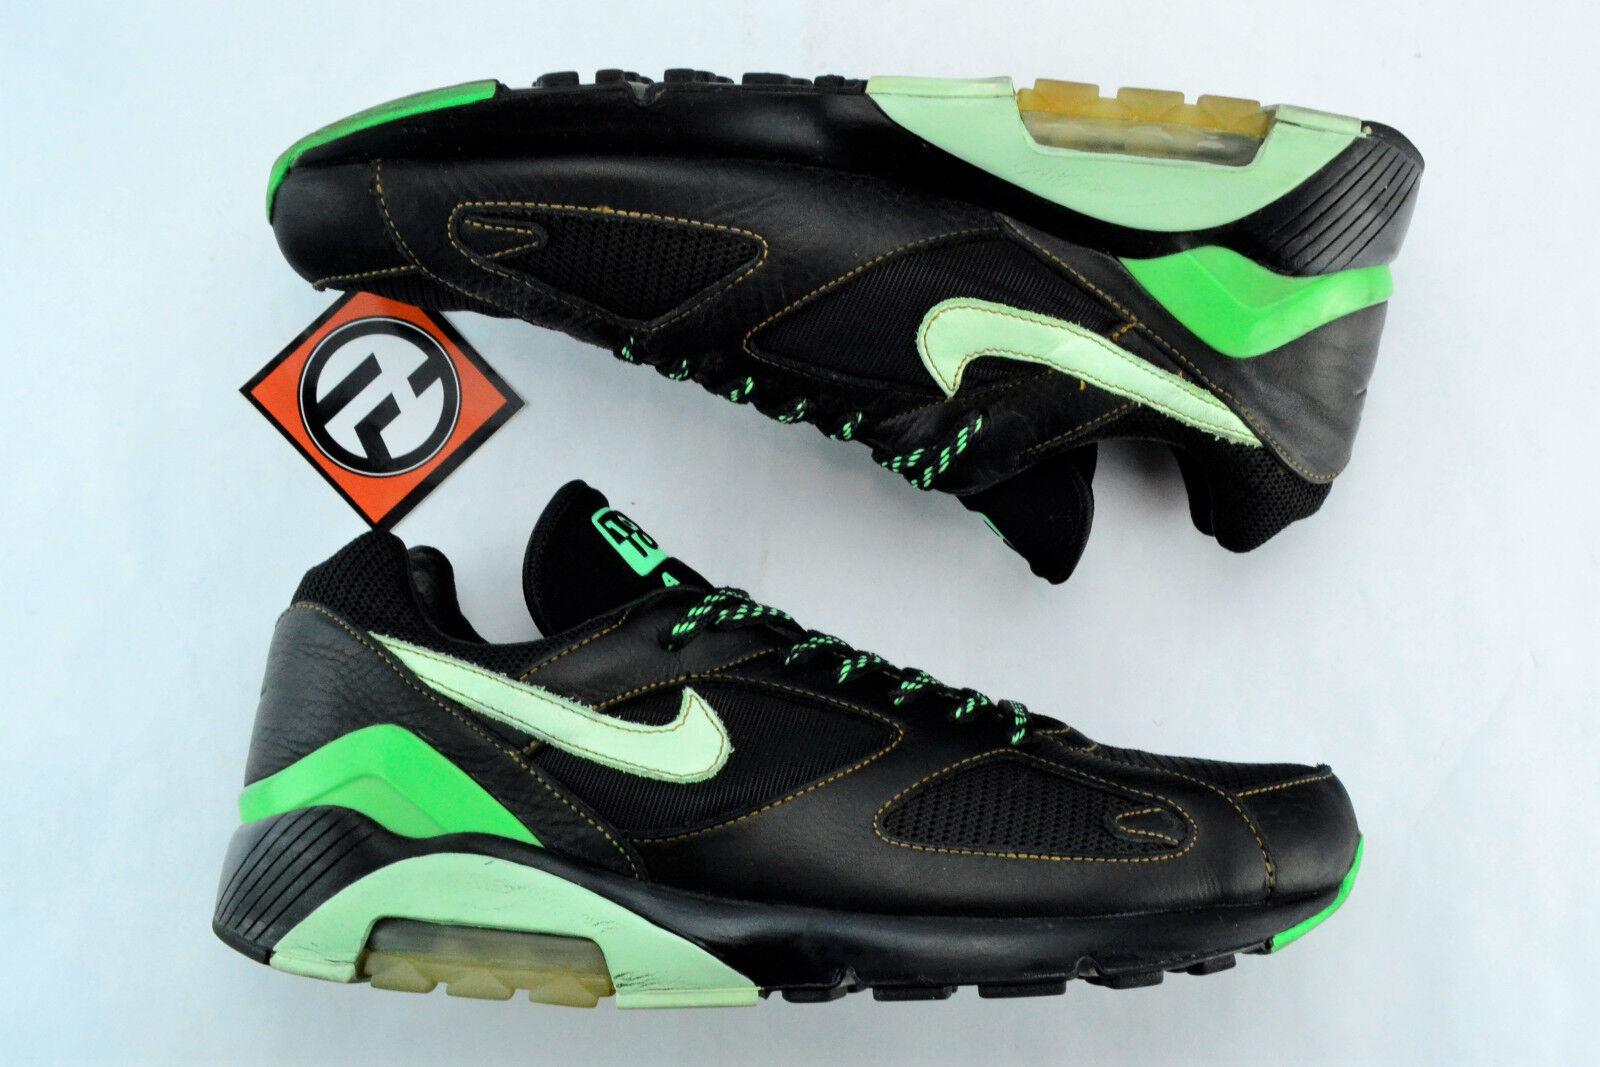 Nike Air Max 180 180 180 Schwarz Neuwertig Gift Grün Gr. 13 611m 310155 031 79d072